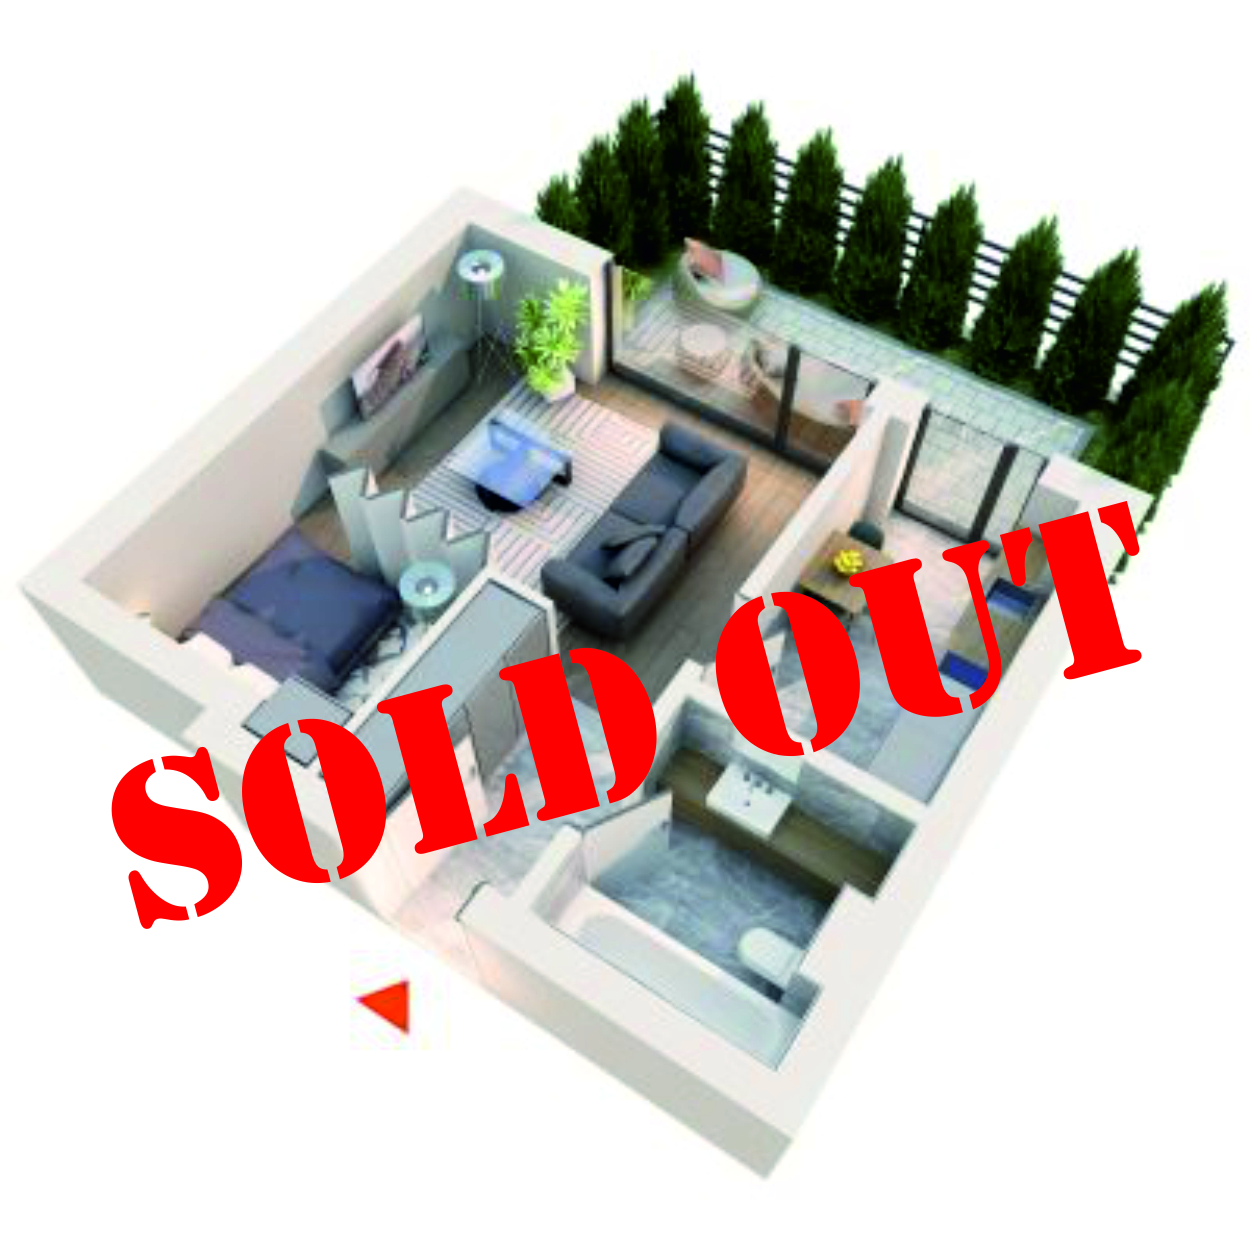 Apartament Studio tip 1A1 | Gradina | Parter | Corp C3 C4 | Faza 2